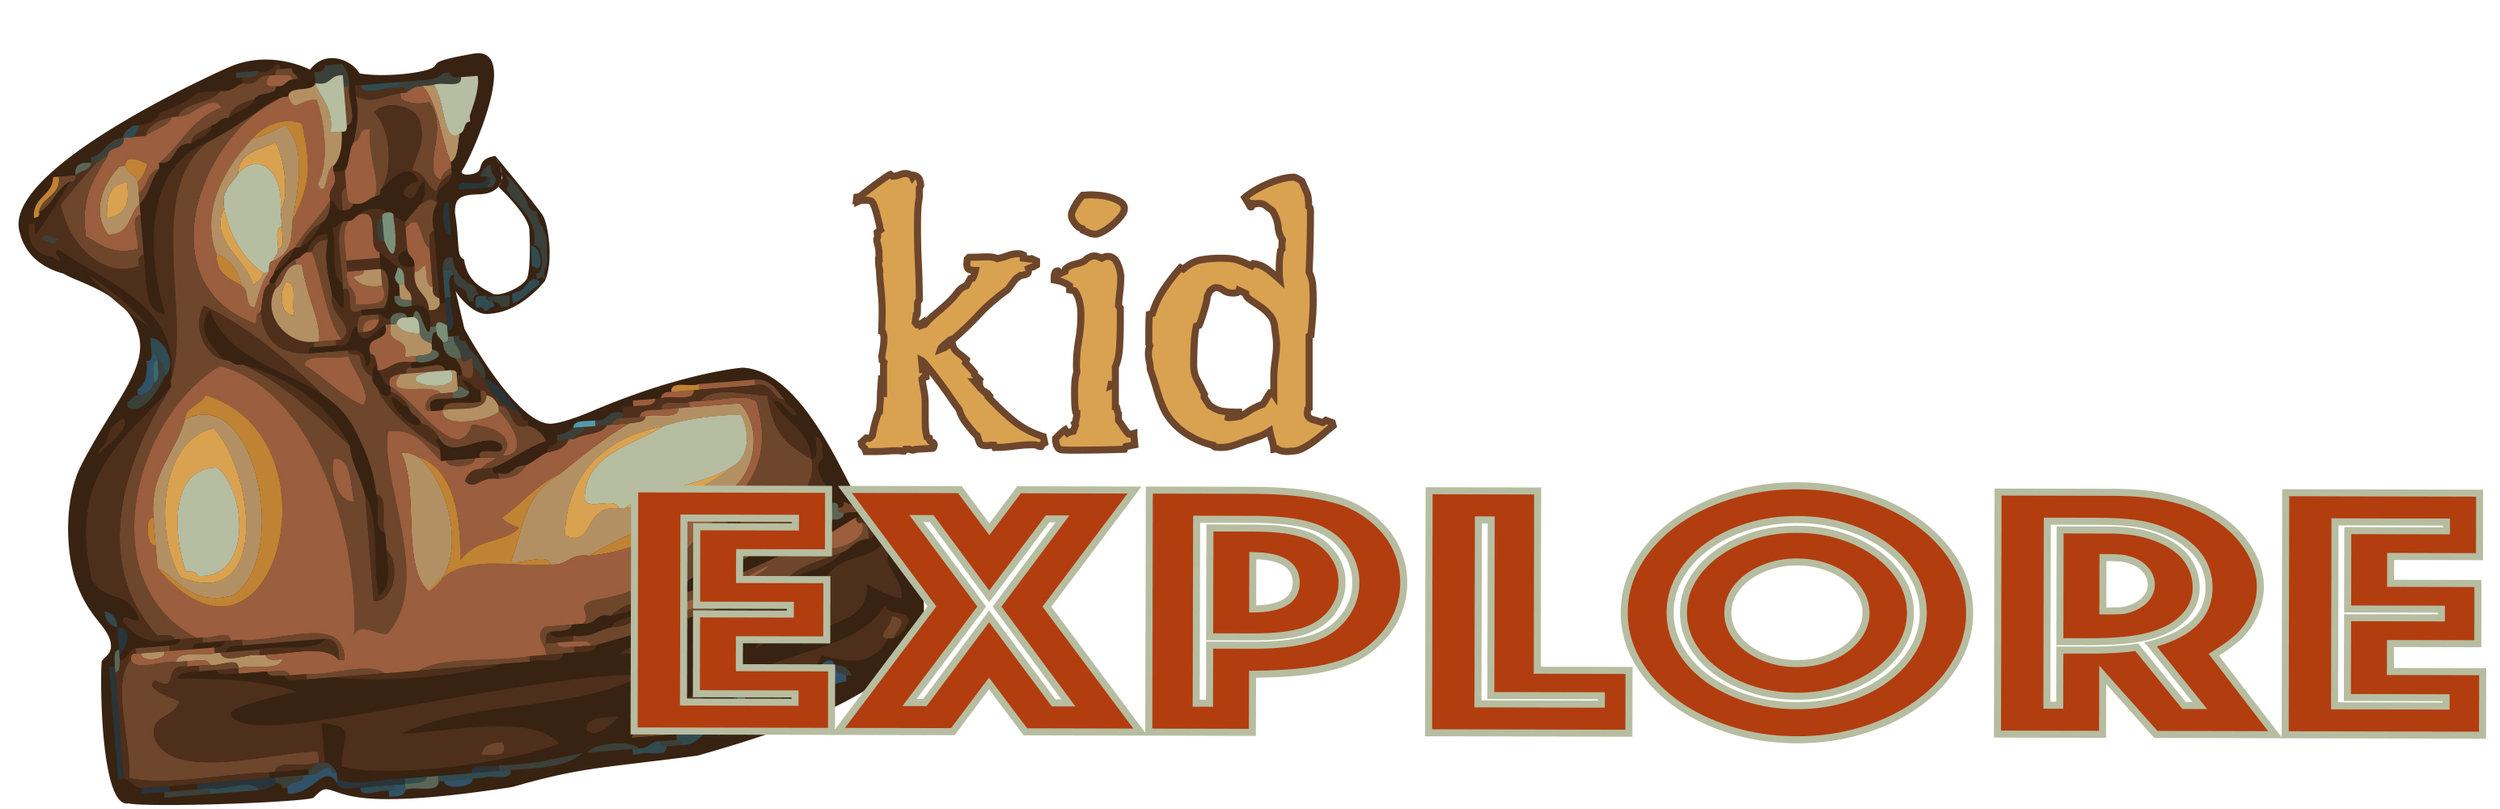 Kid_explore_logo_HORIZONTAL (large).jpg